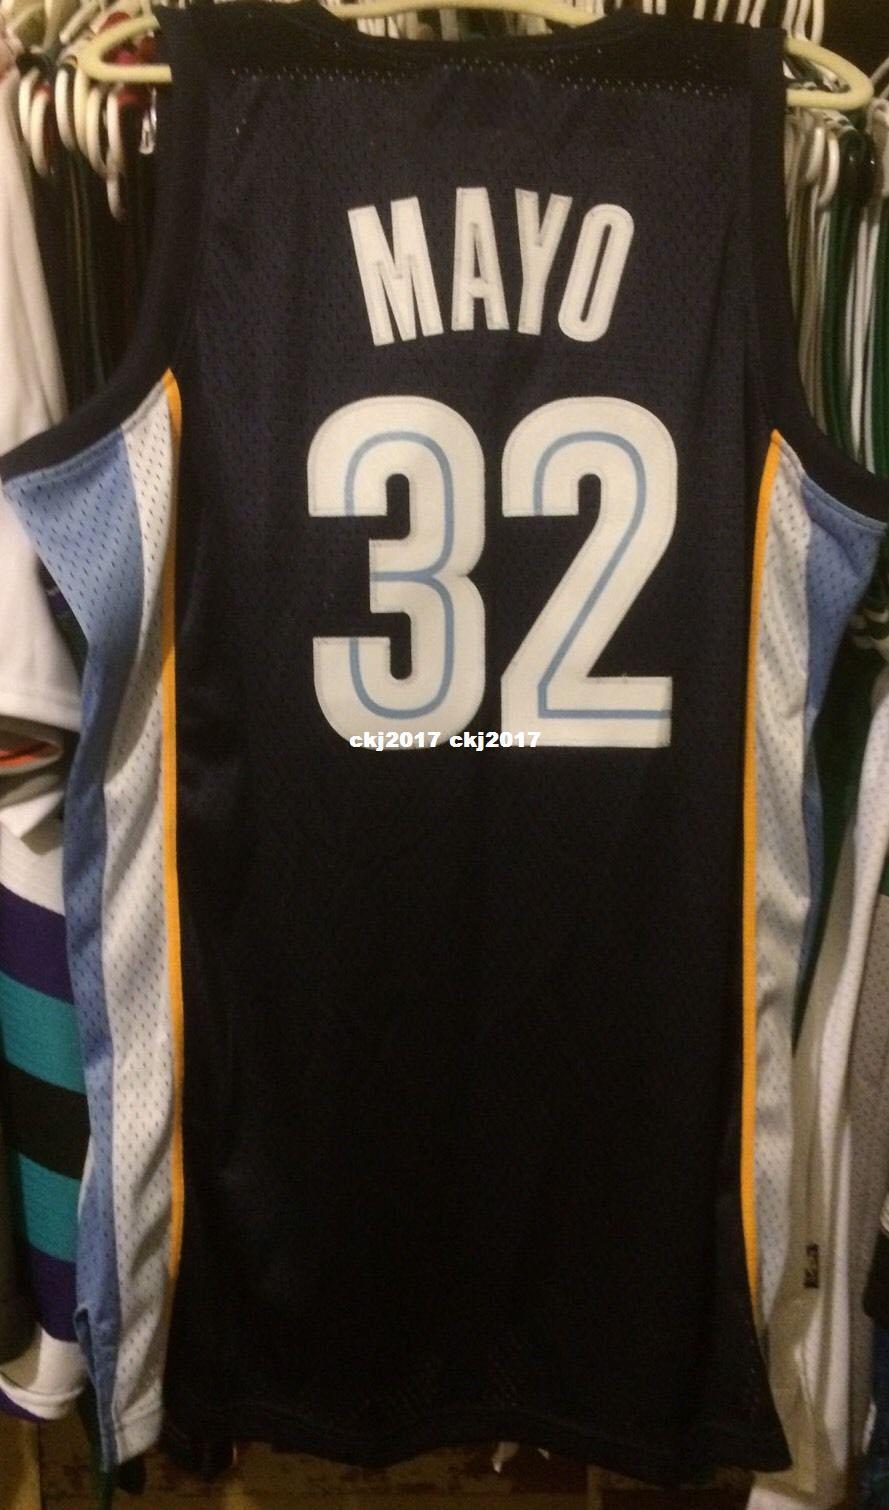 43f3bf6f350 Basketball T Shirts Australia - Nils Stucki Kieferorthopäde